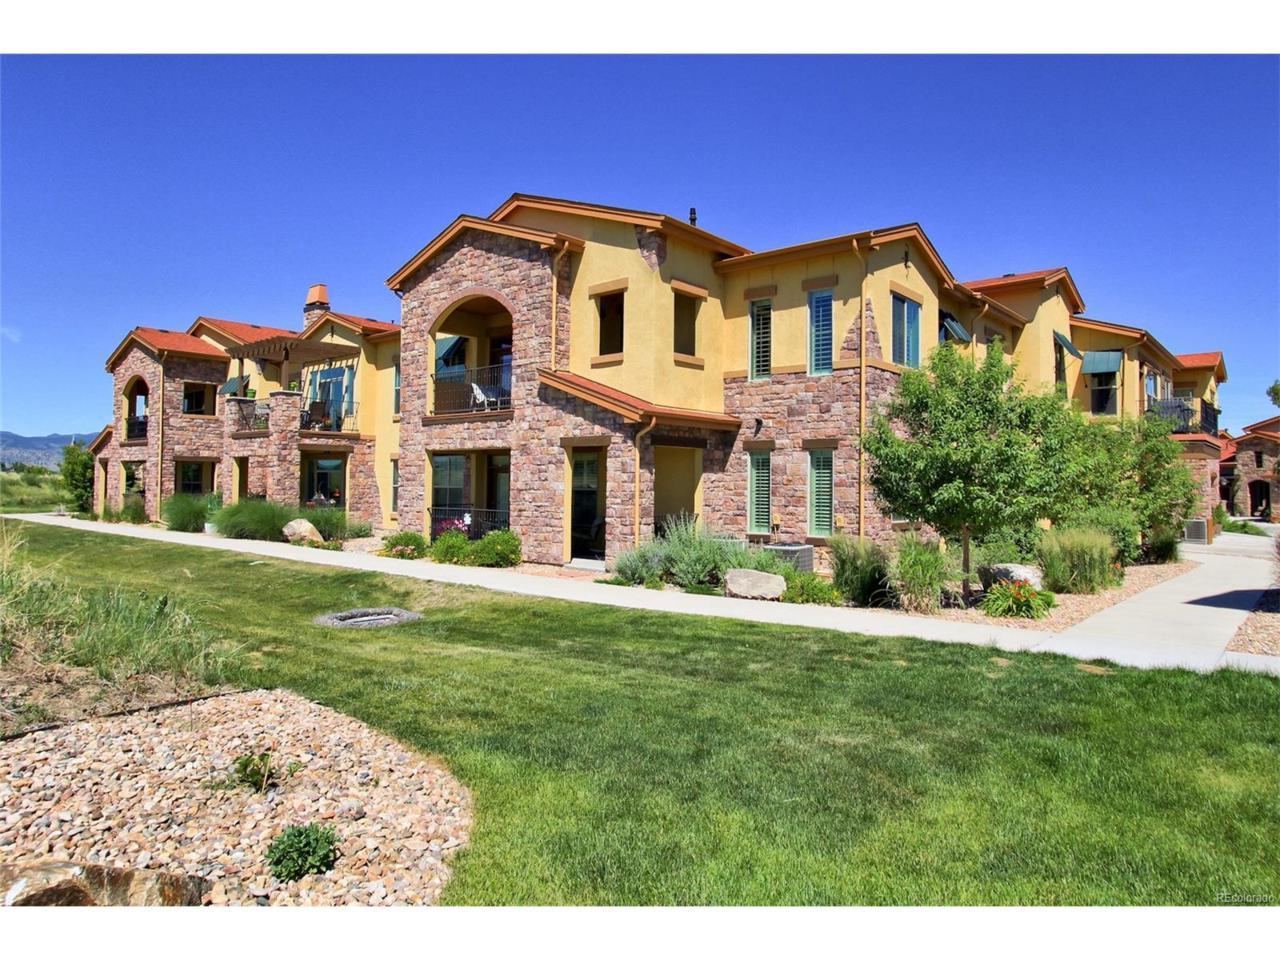 2366 Primo Road #203, Highlands Ranch, CO 80129 (MLS #5302792) :: 8z Real Estate